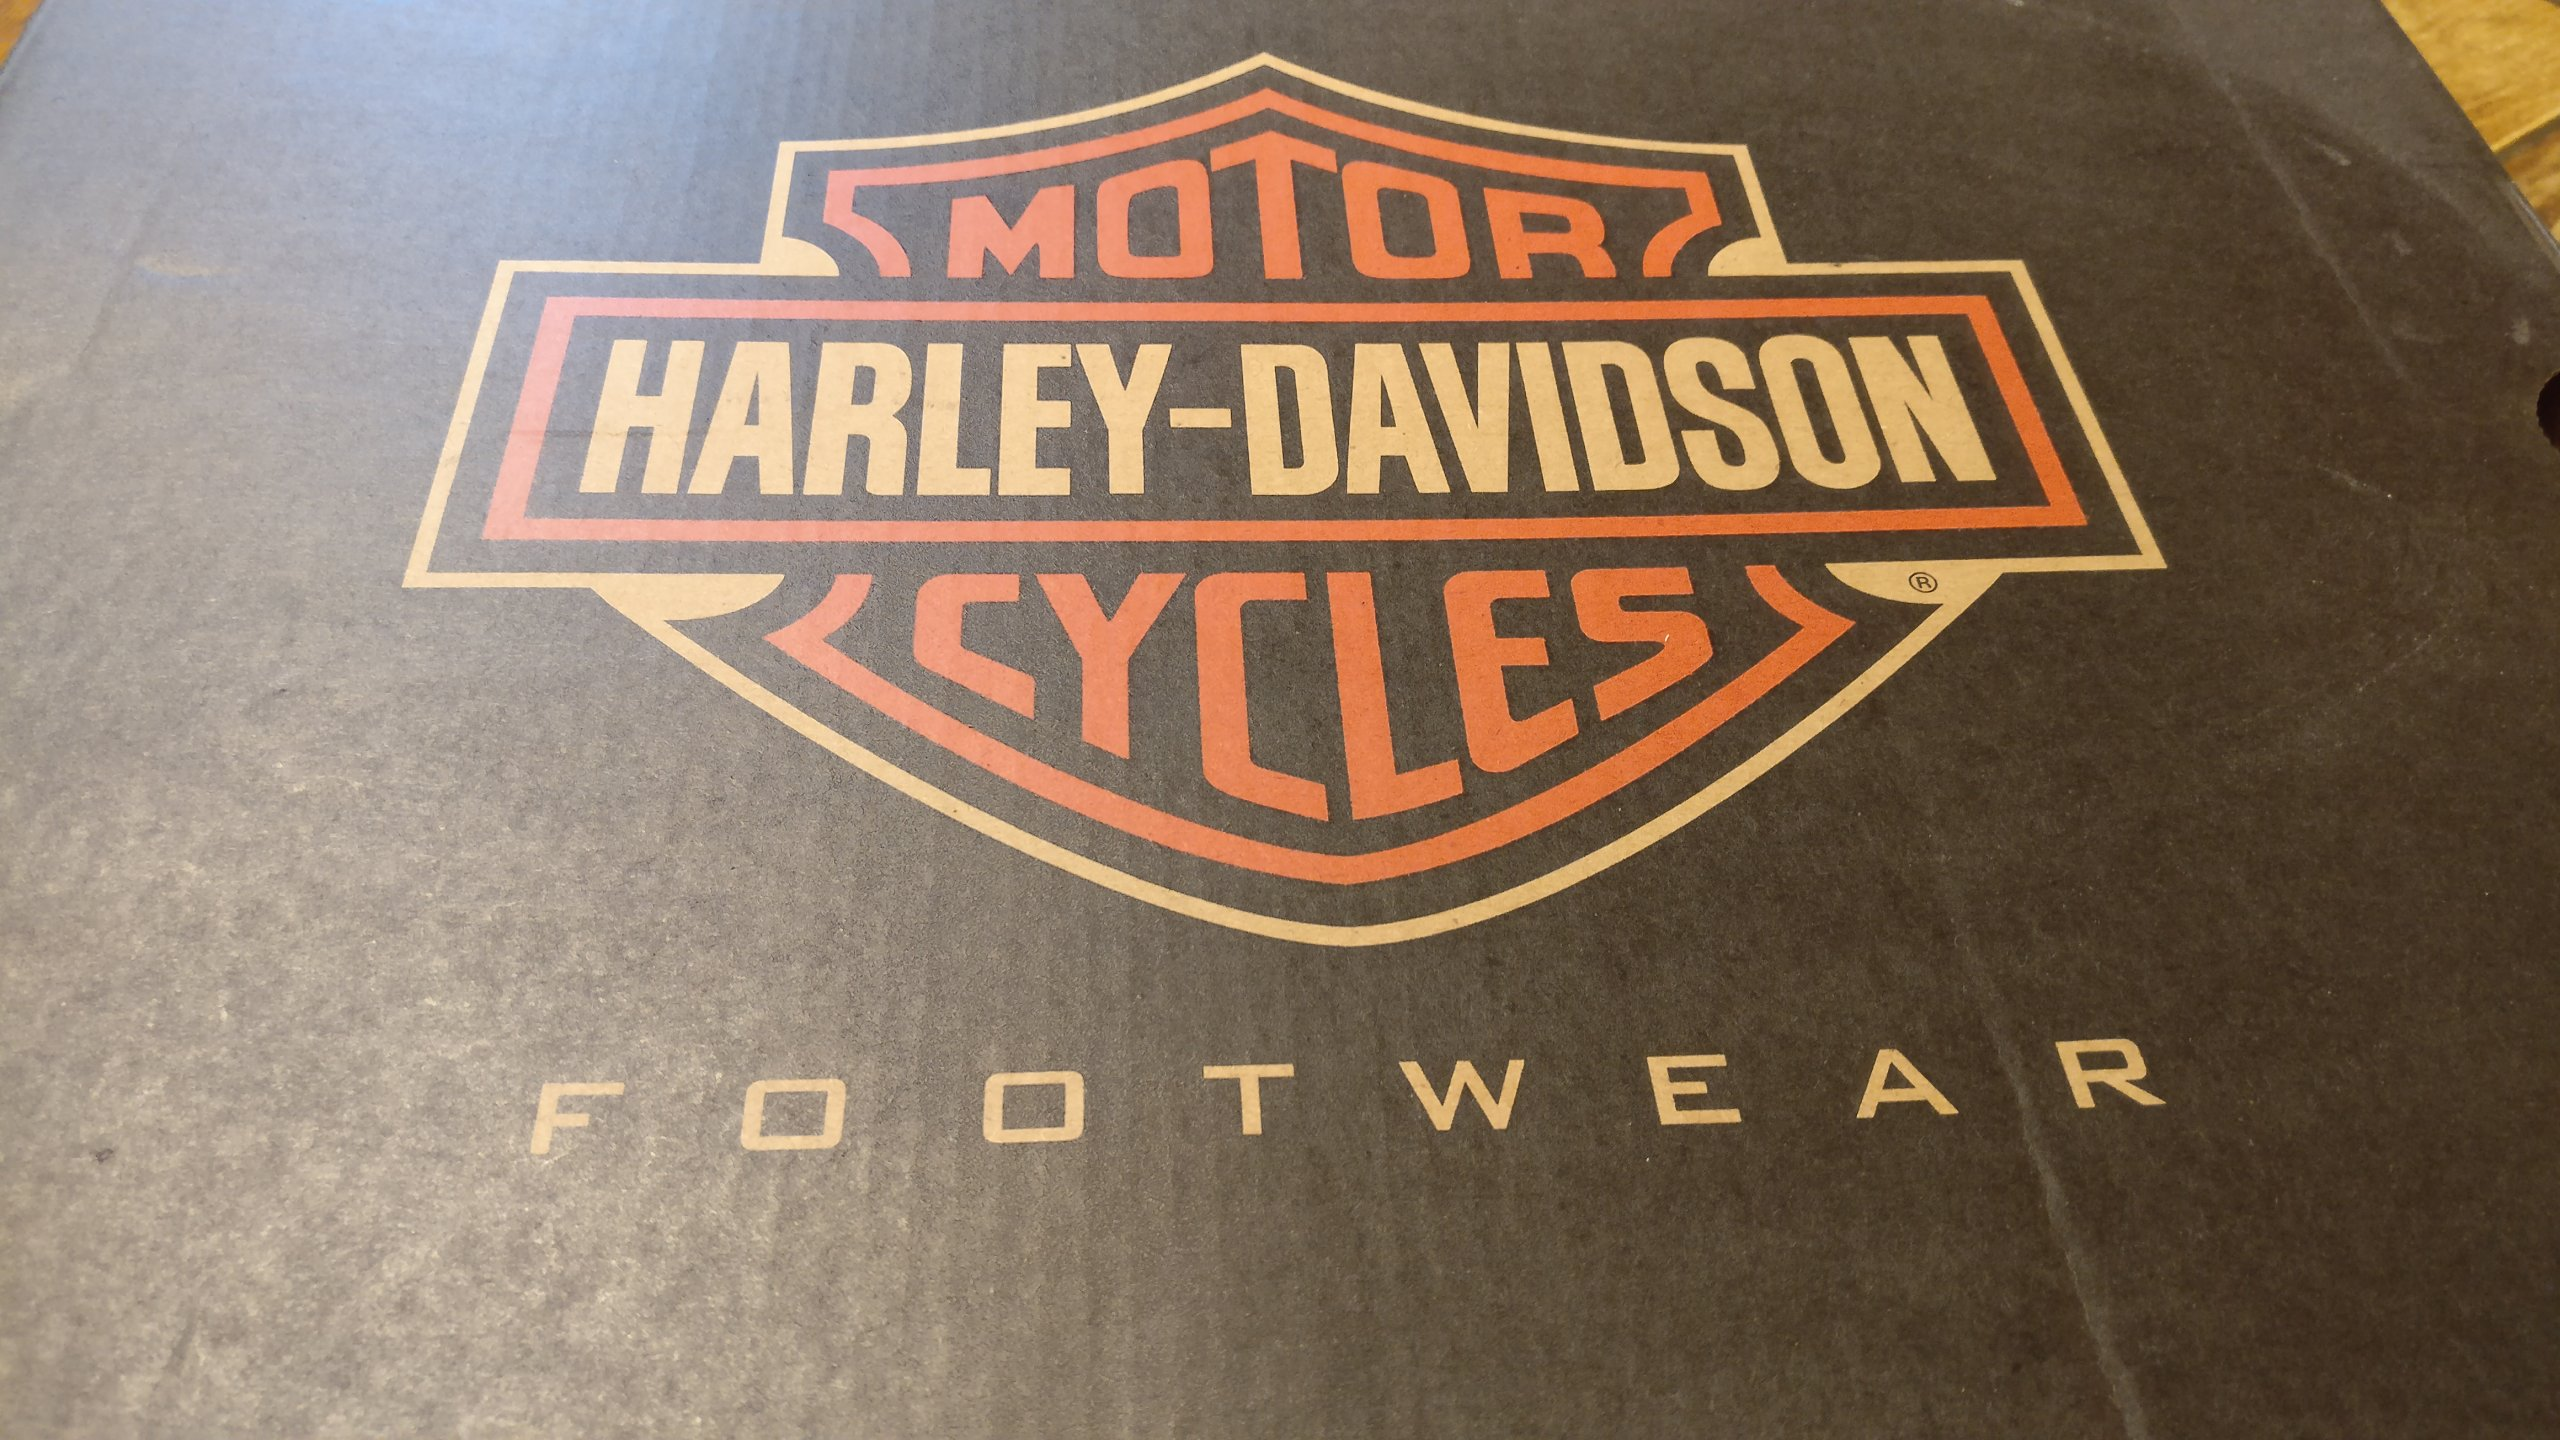 d446ffc2ffa7a Botki sznurowane Harley Davidson JOSHUA 100% skóra - 7168060948 ...